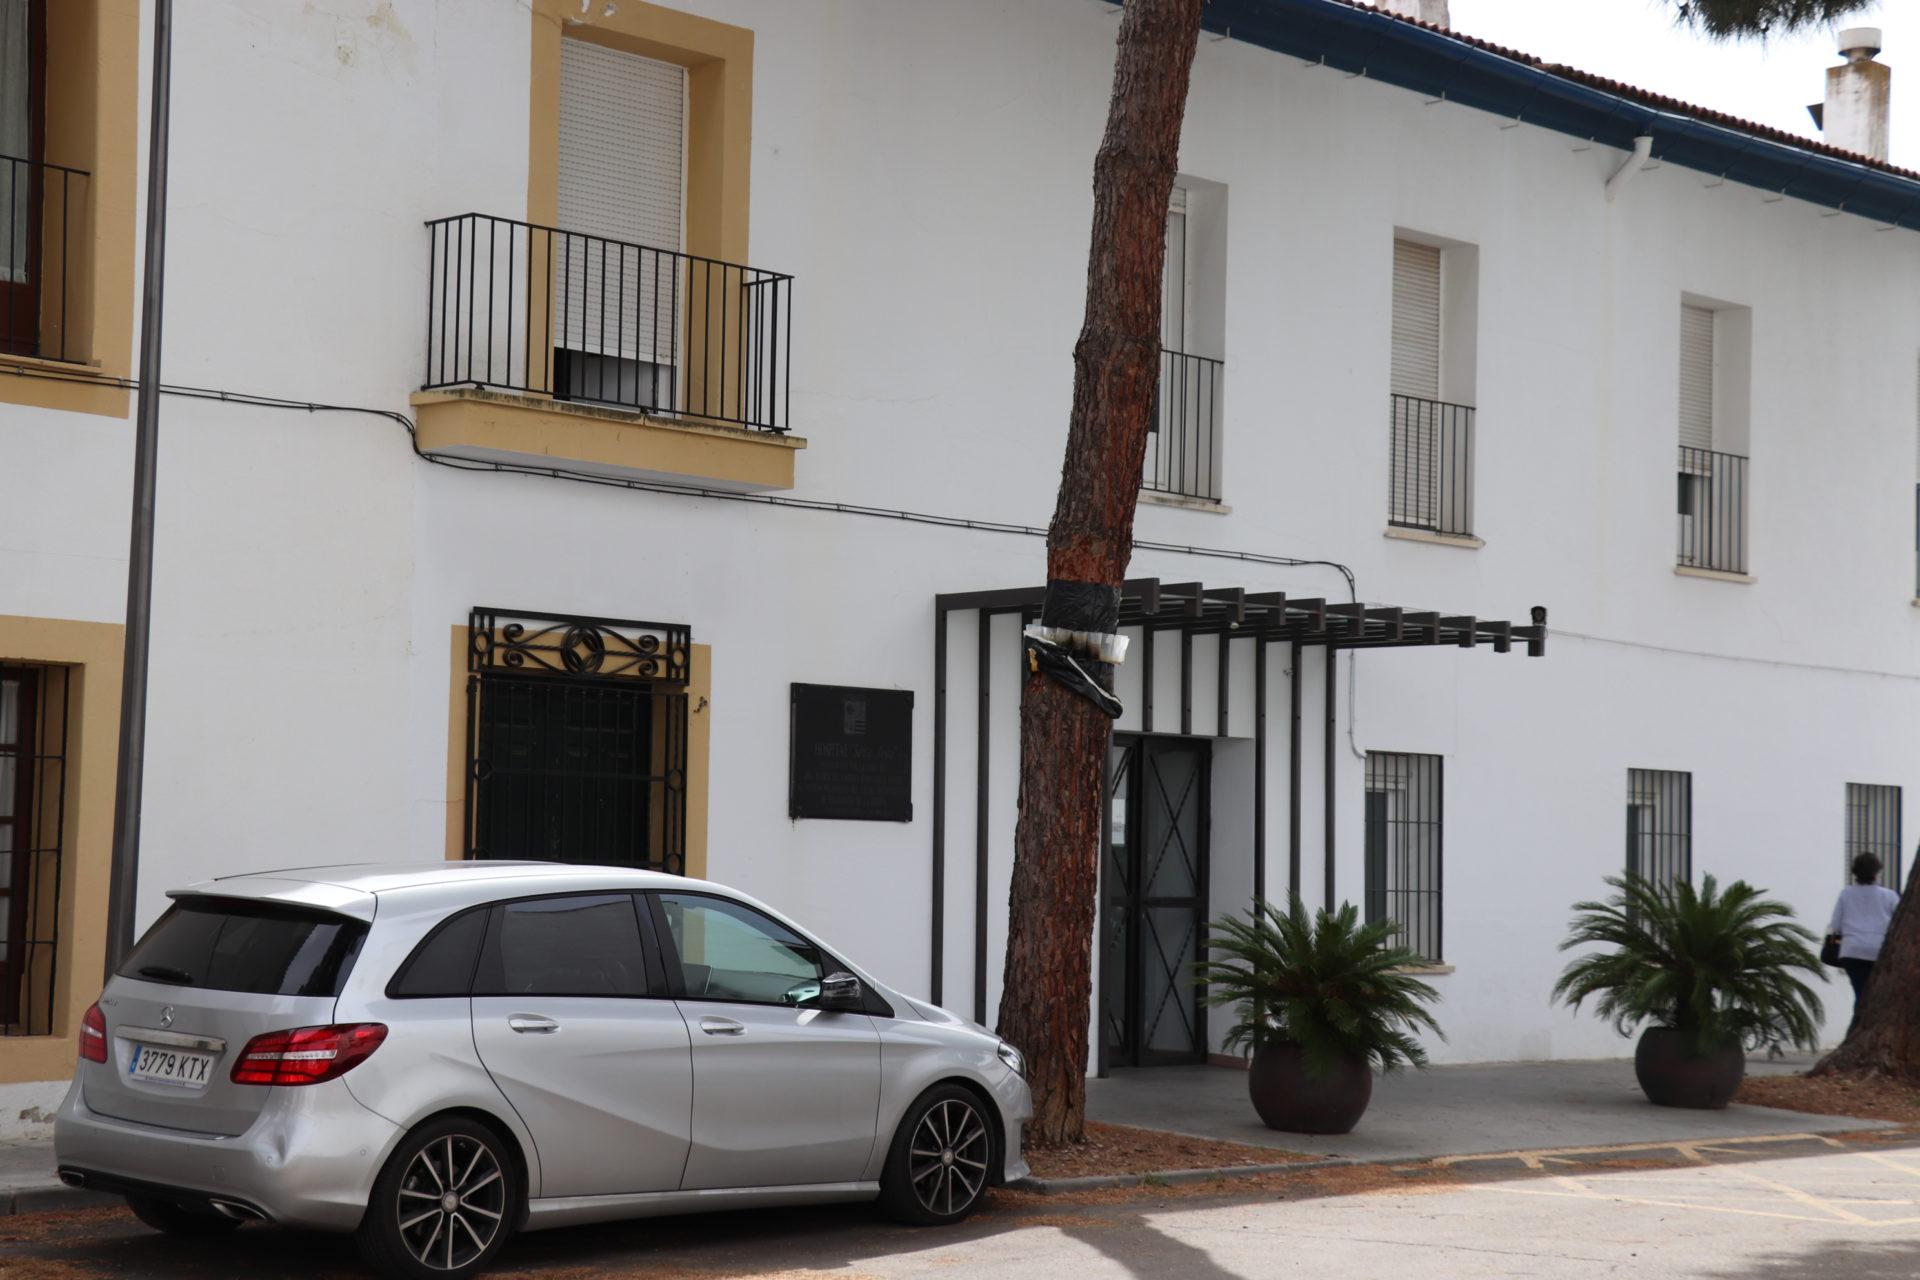 Balance positivo de los seis primeros meses del hospital Ribera Santa Justa